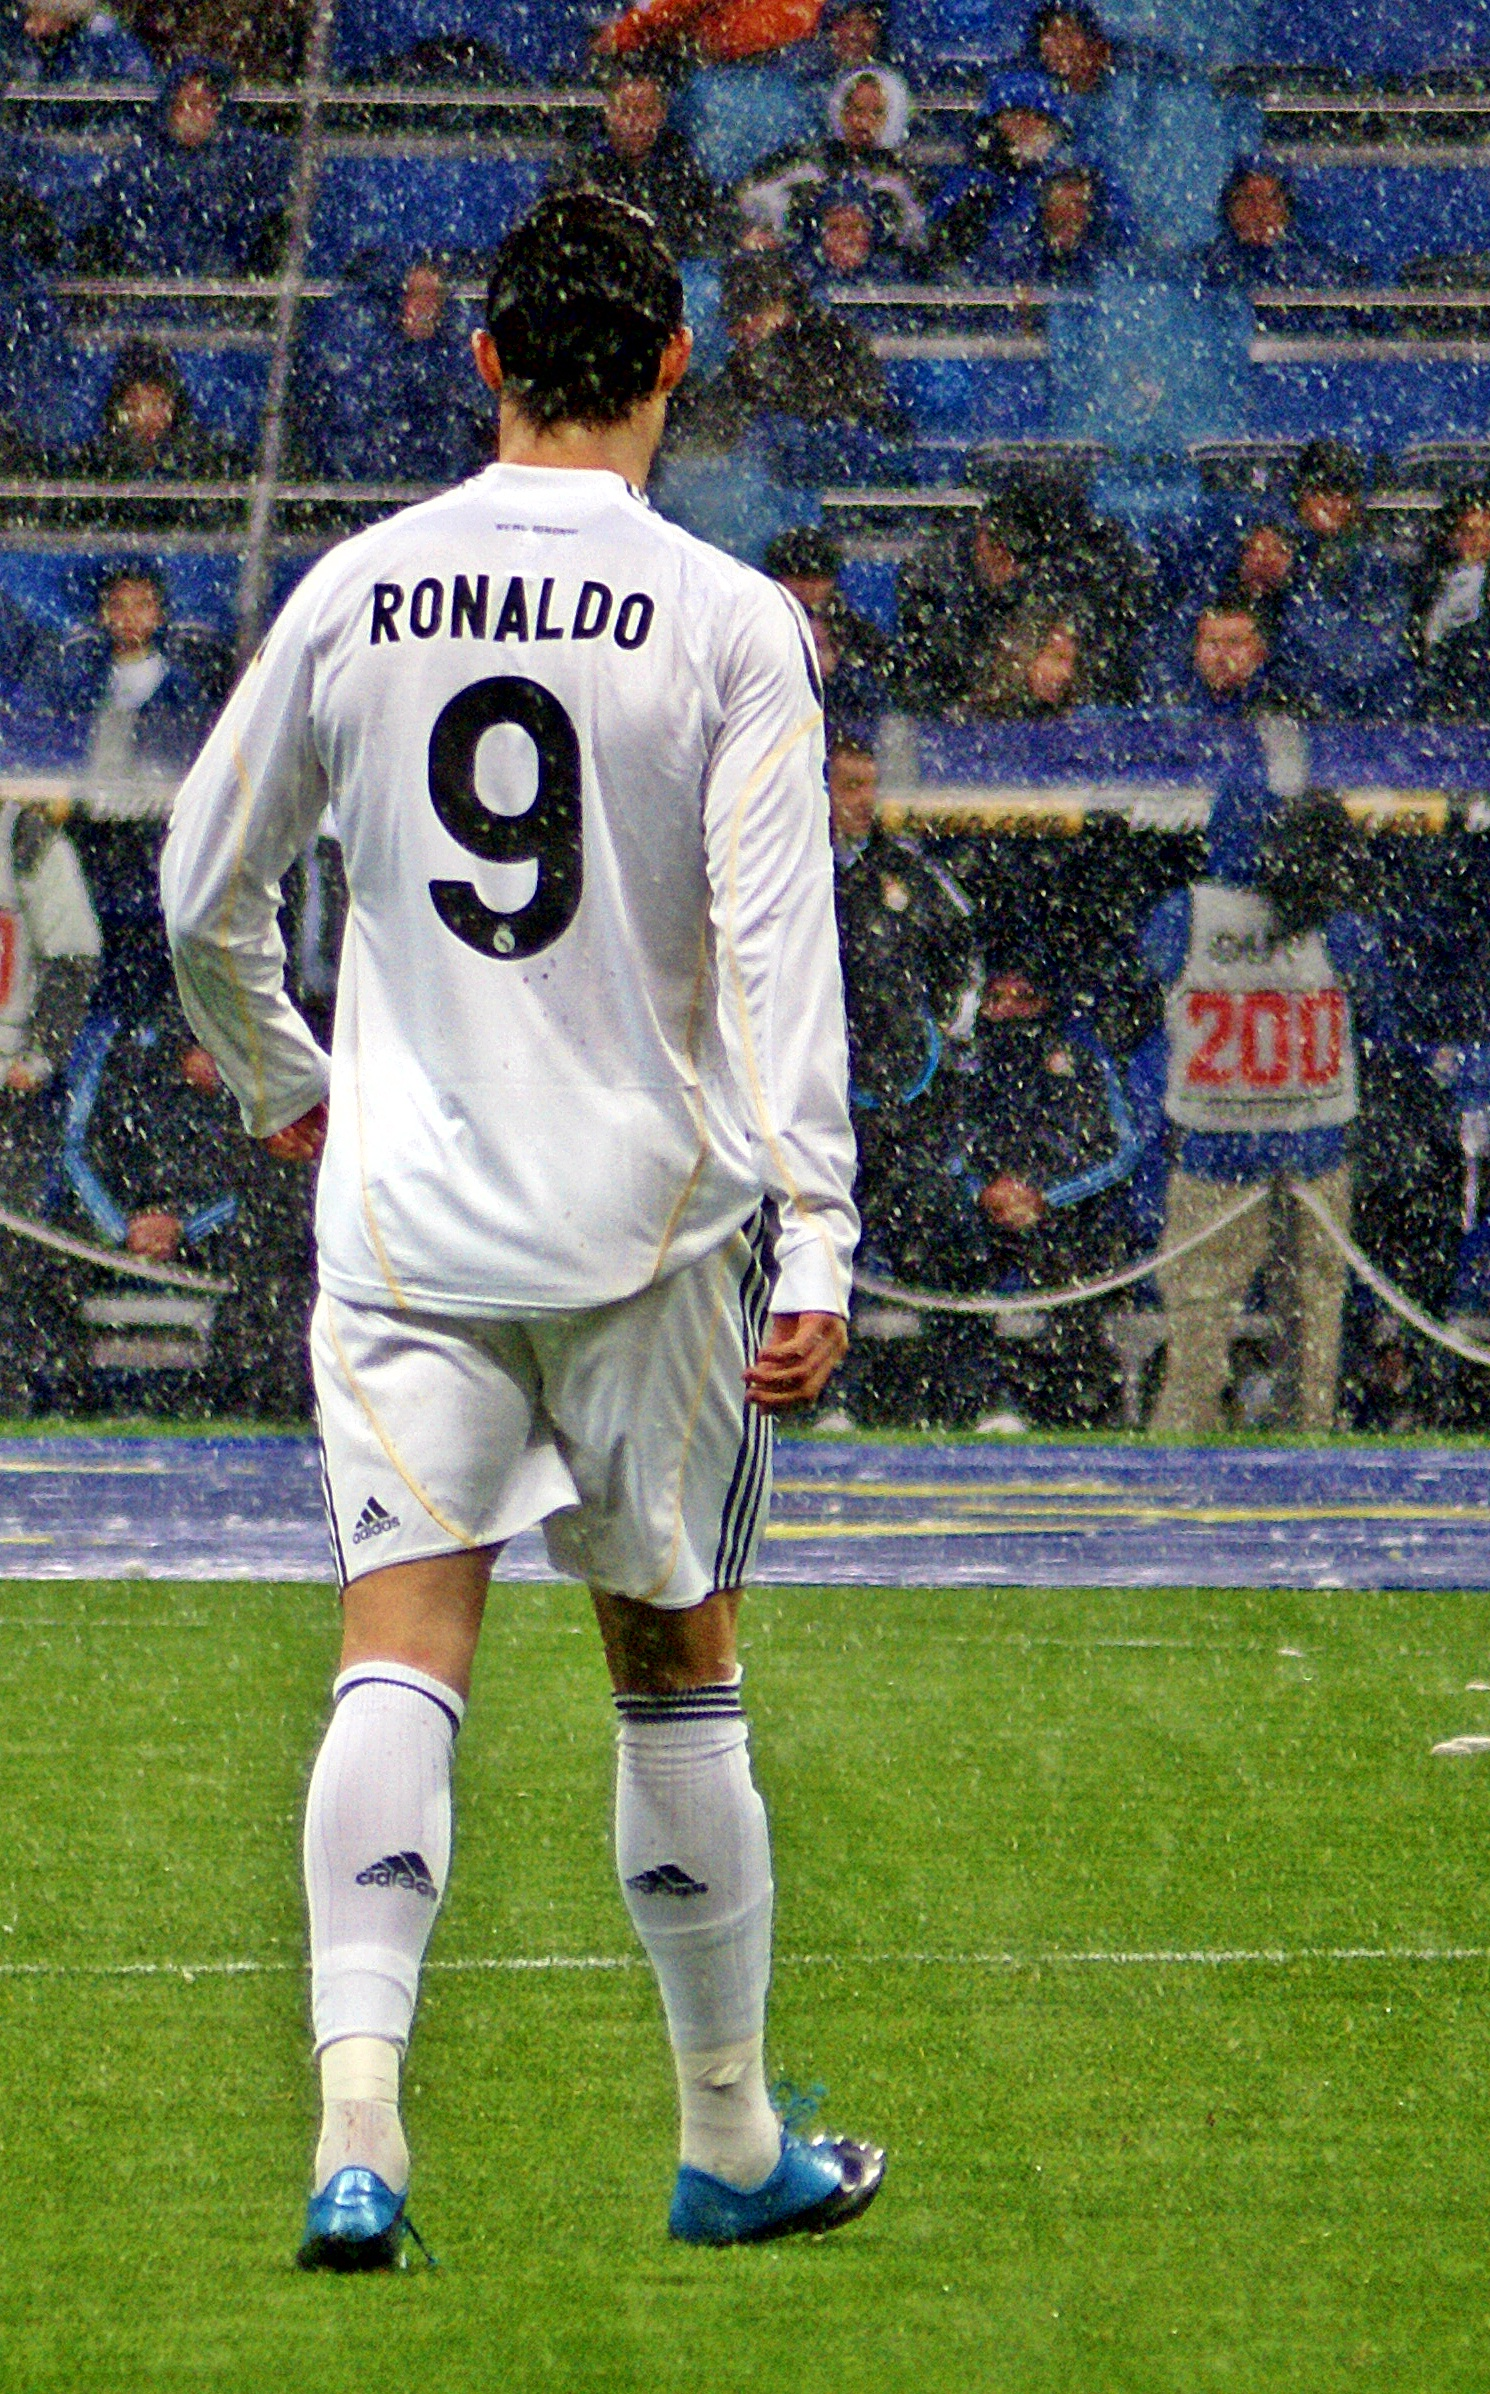 Ronaldo Vertical : ronaldo, vertical, File:Cristiano, Ronaldo, Madrid.jpg, Wikimedia, Commons